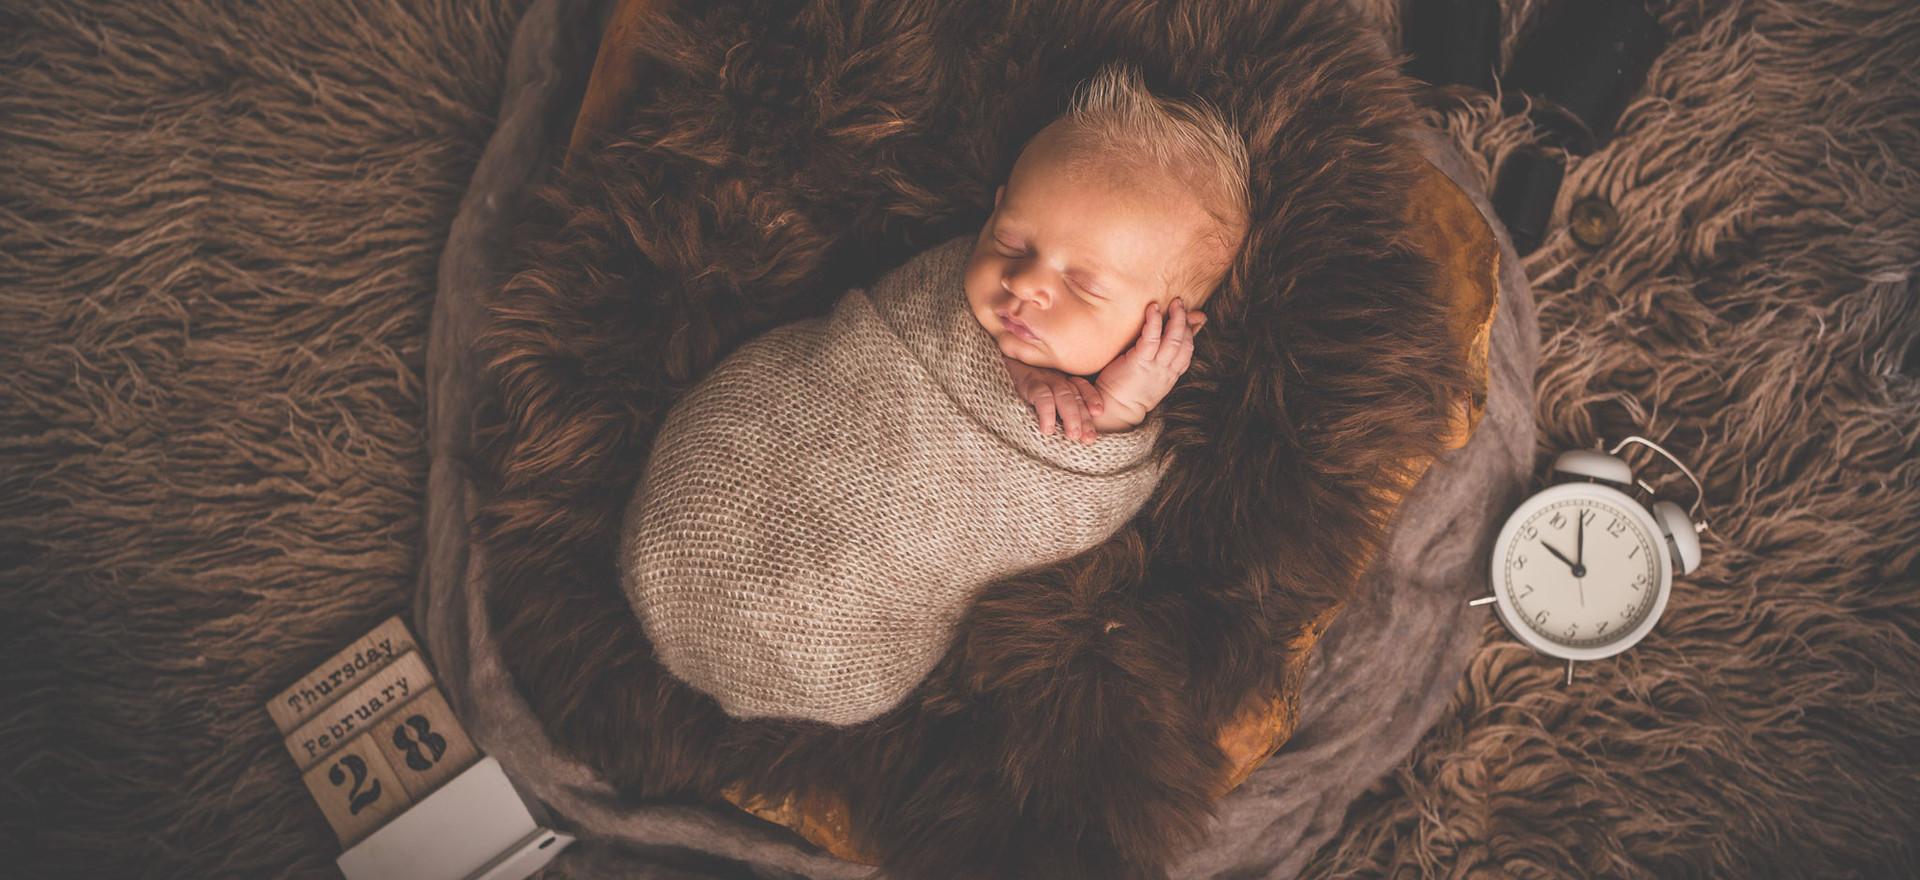 Spiegel Baby Fotografie-65.jpg